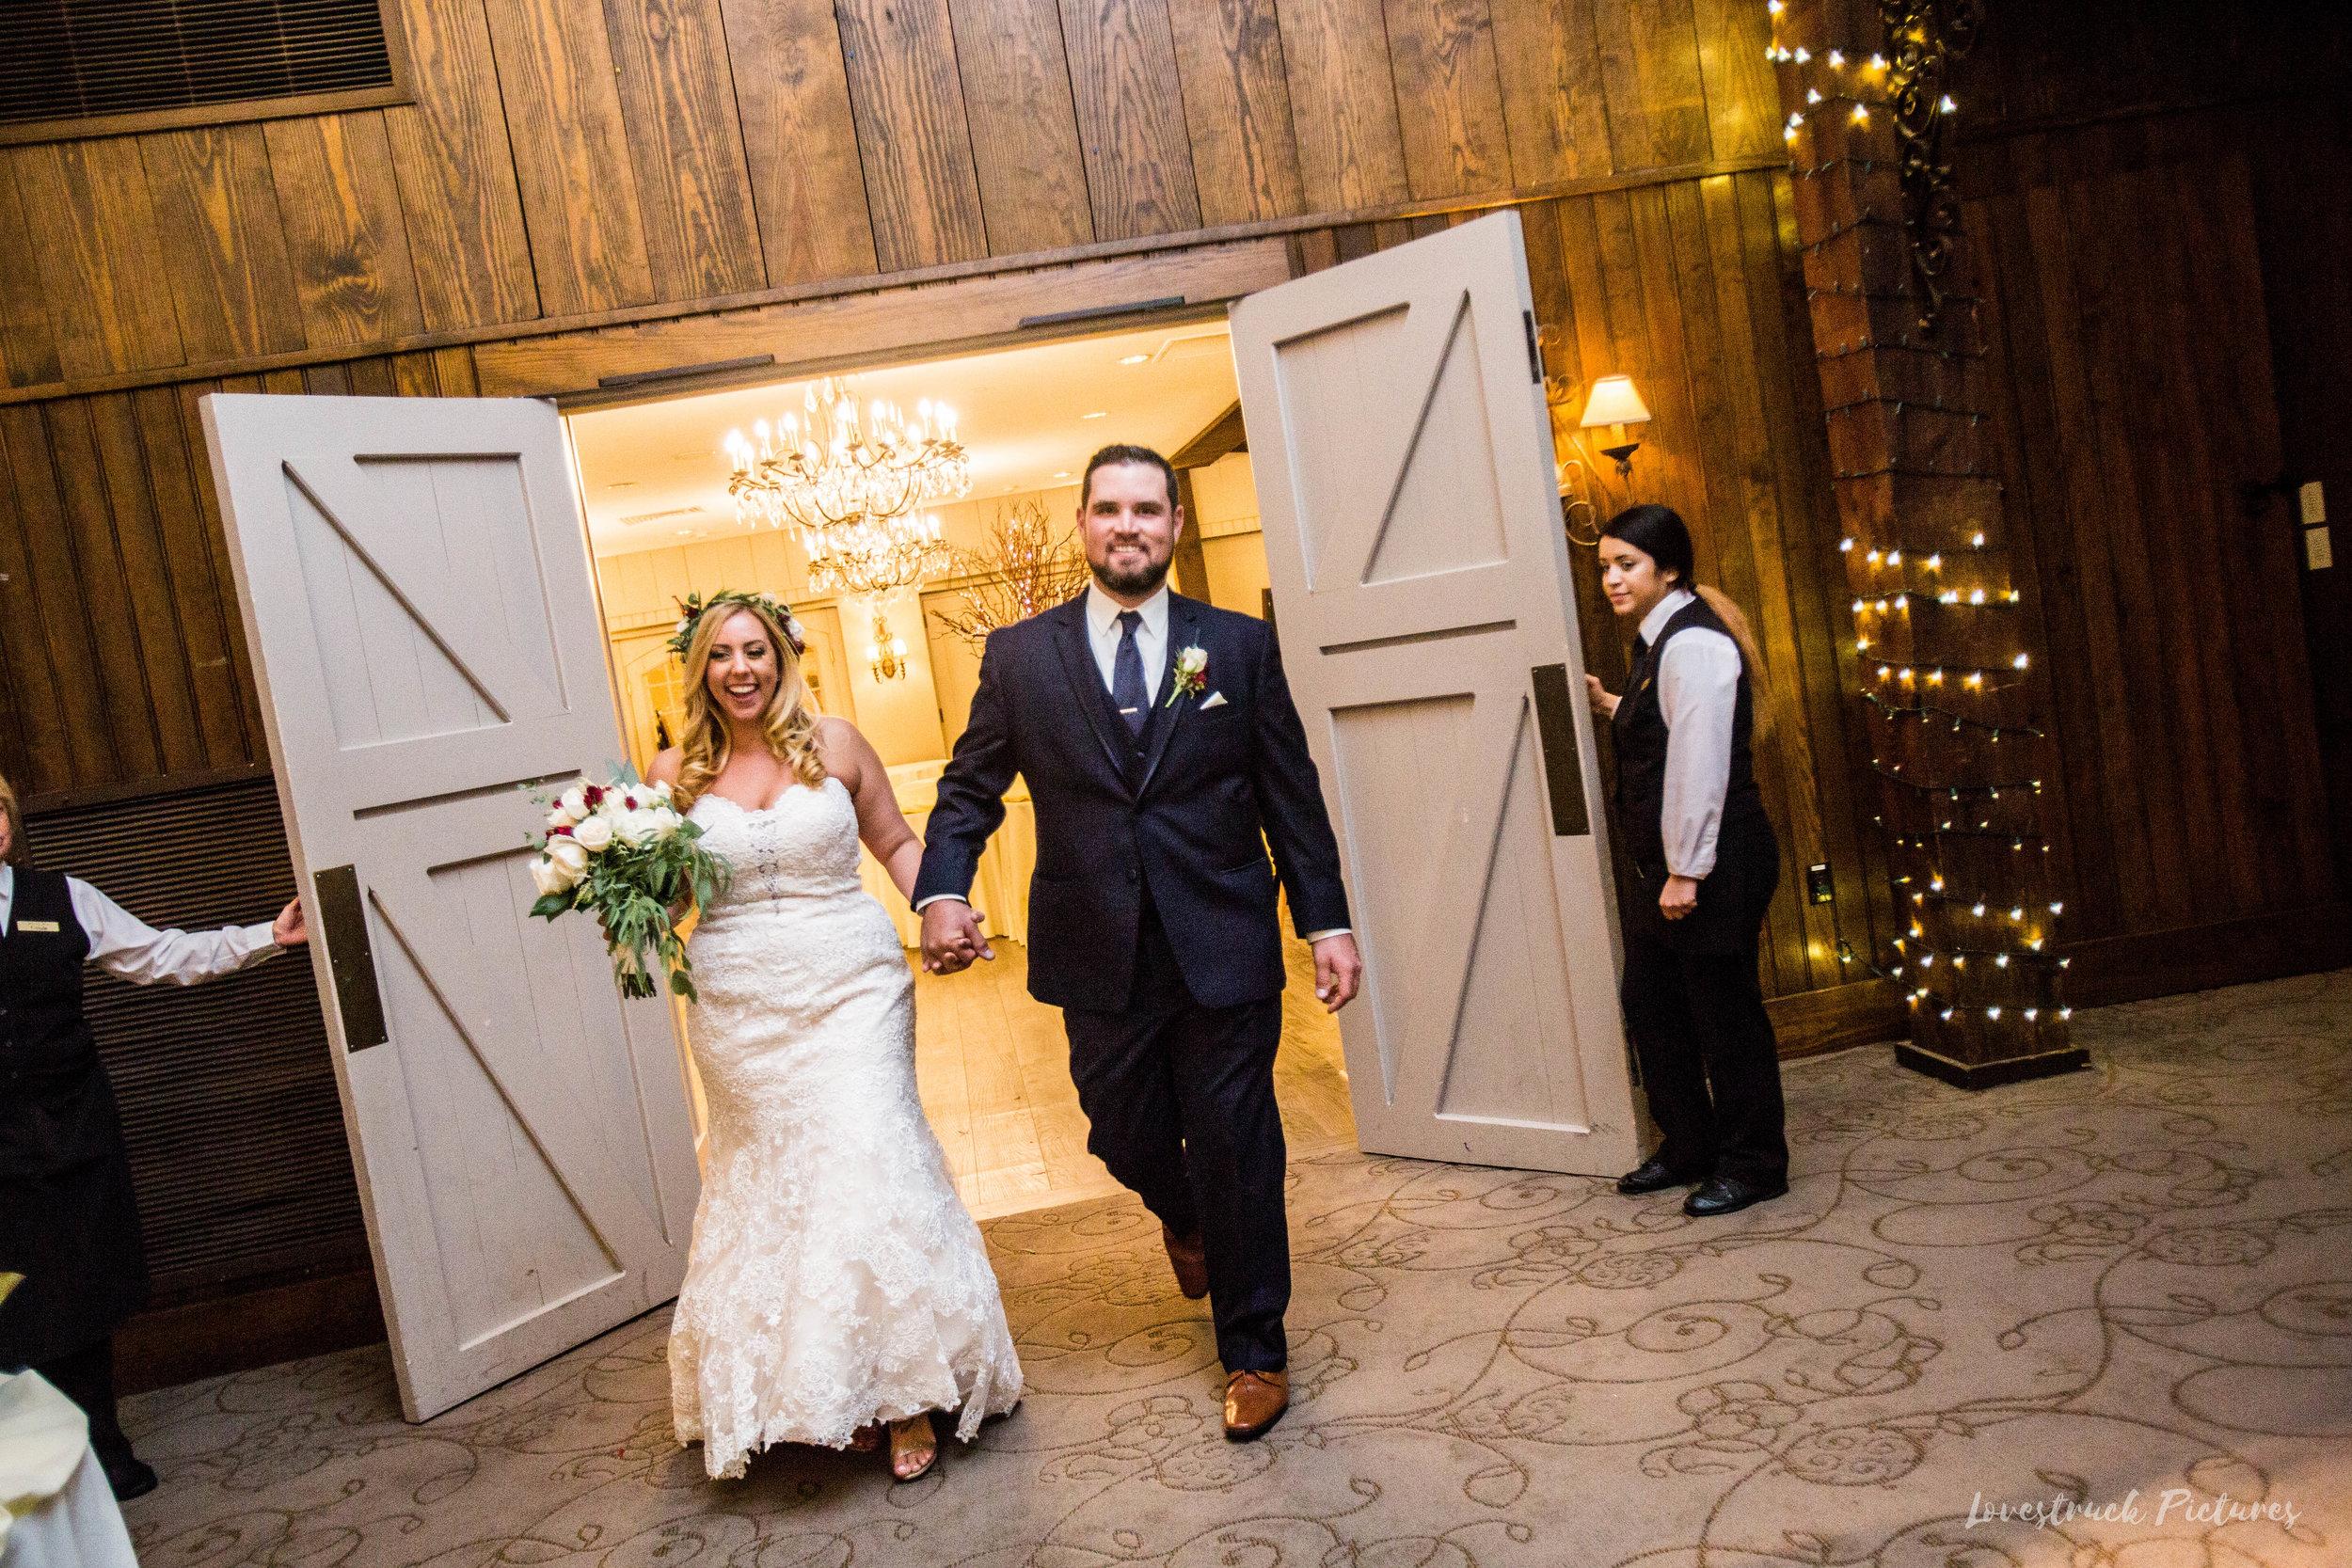 NORMANDY_FARMS_WEDDING_BLUEBELL_PA--61.jpg